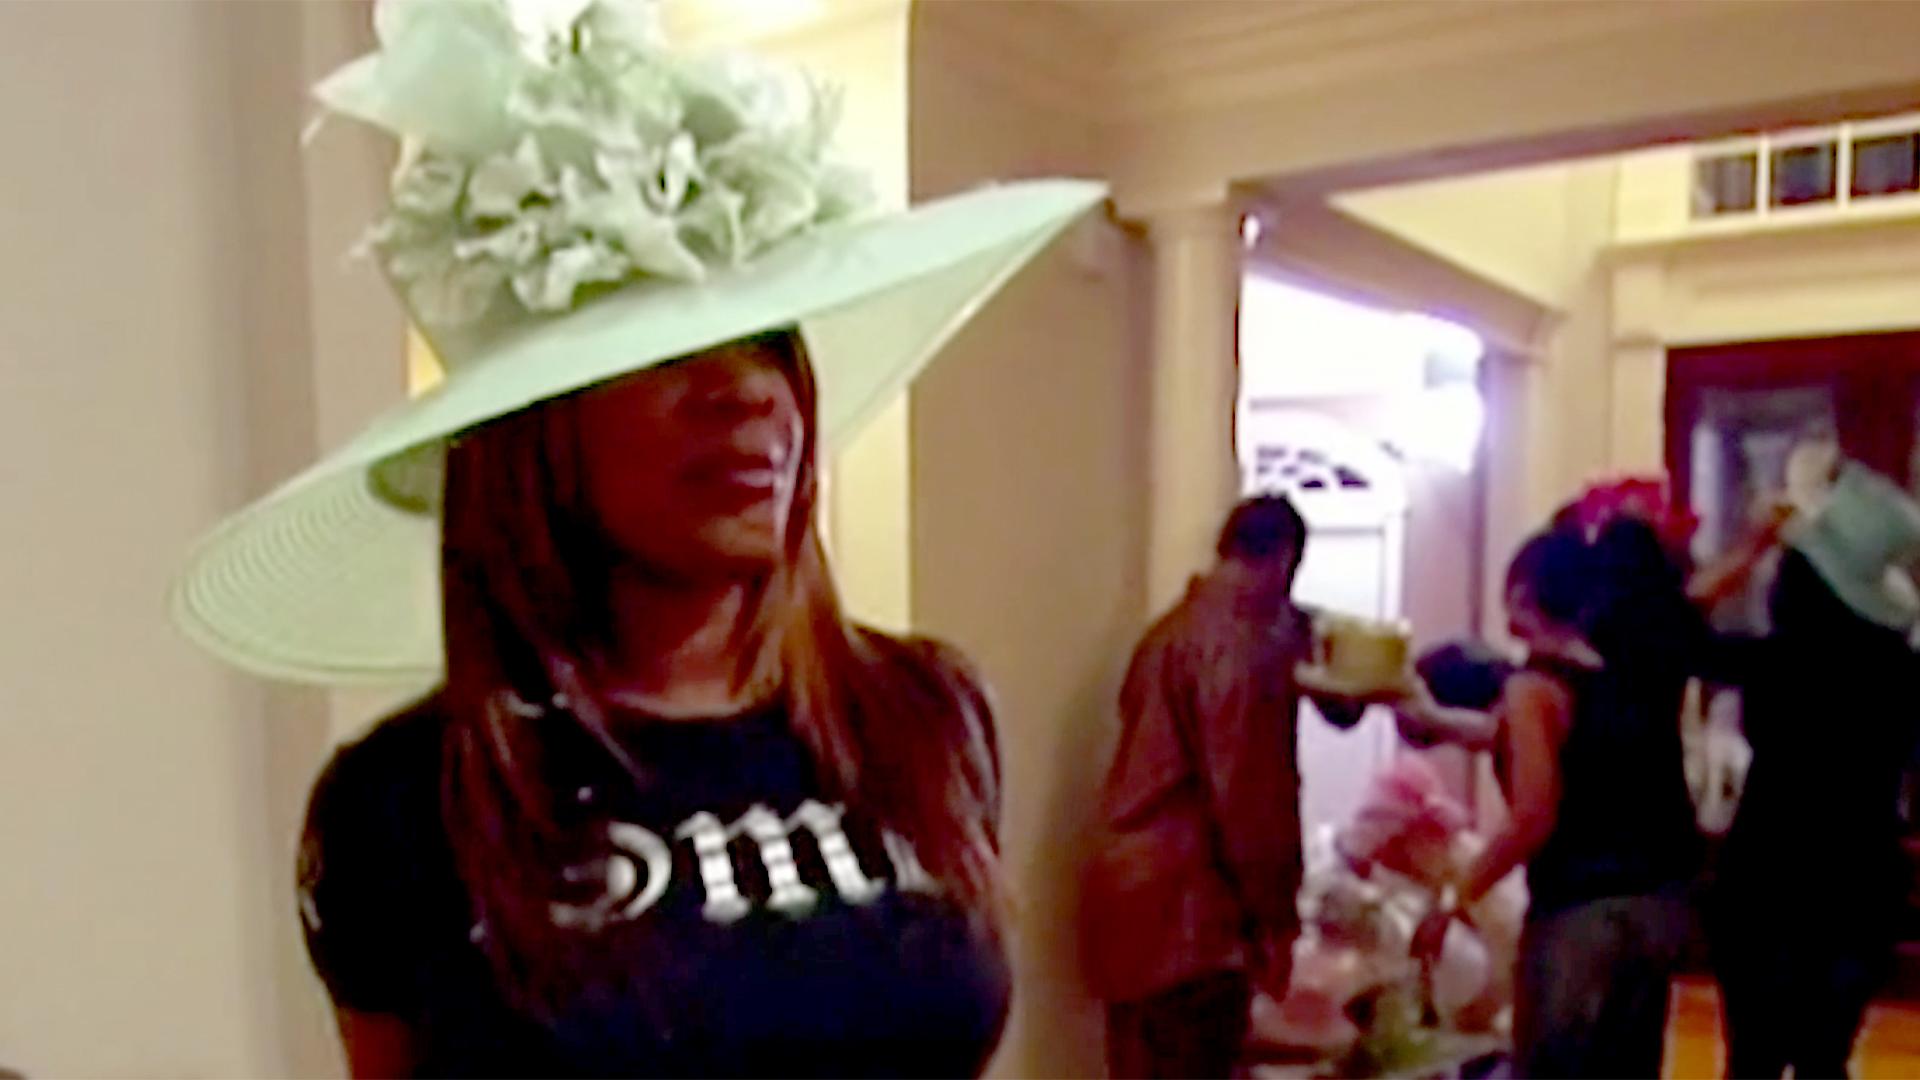 Rhoas Kandi Burruss Launches Koated Beauty Line Lookbook Jill Lip Matte 11 Flawless Maroon The Real Housewives Of Atlanta Og Has Come A Fashionably Long Way Since Season 1